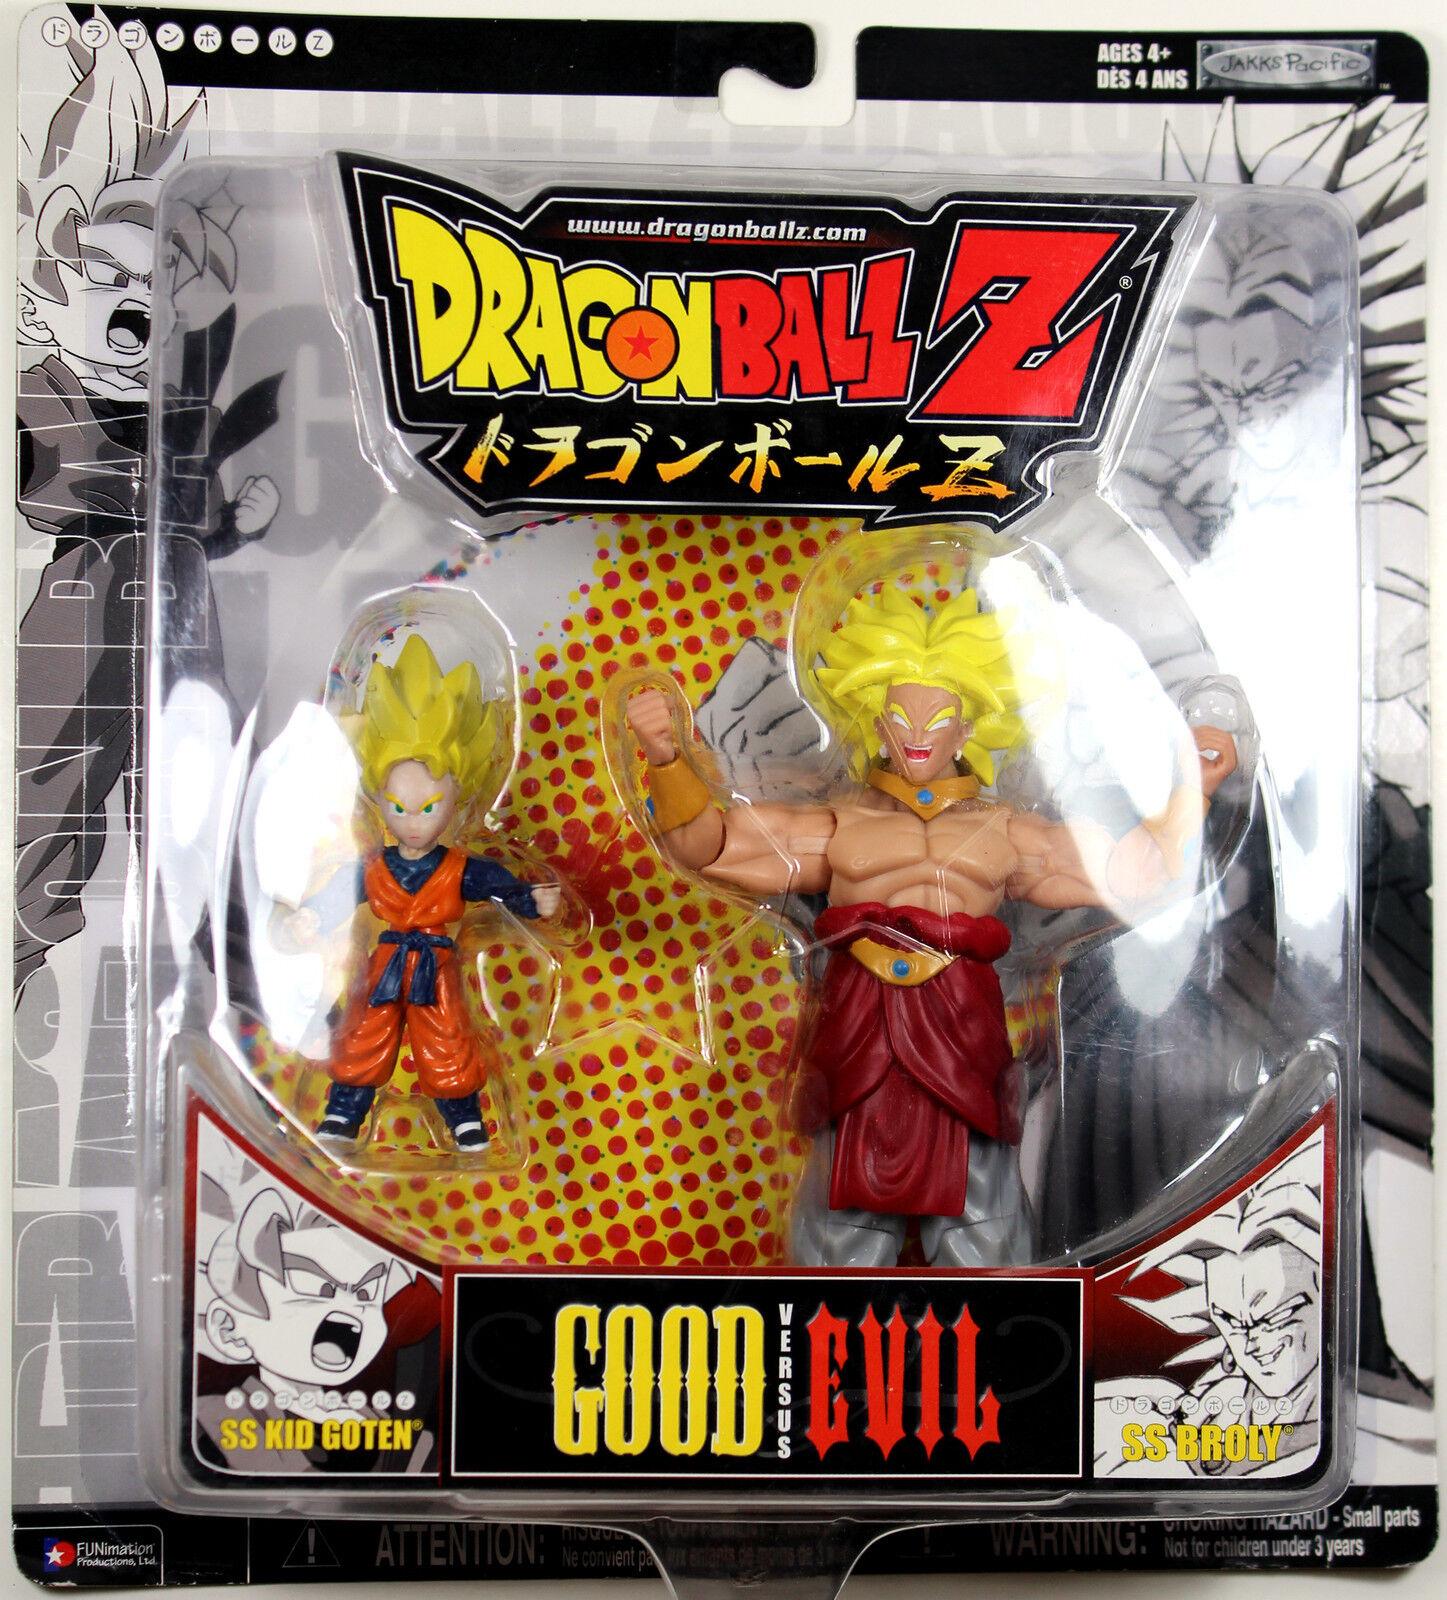 Dragonball Z  SS KID GOTEN & SS BROLY (Good vs. Evil) Set  JAKKS DBZ RARE